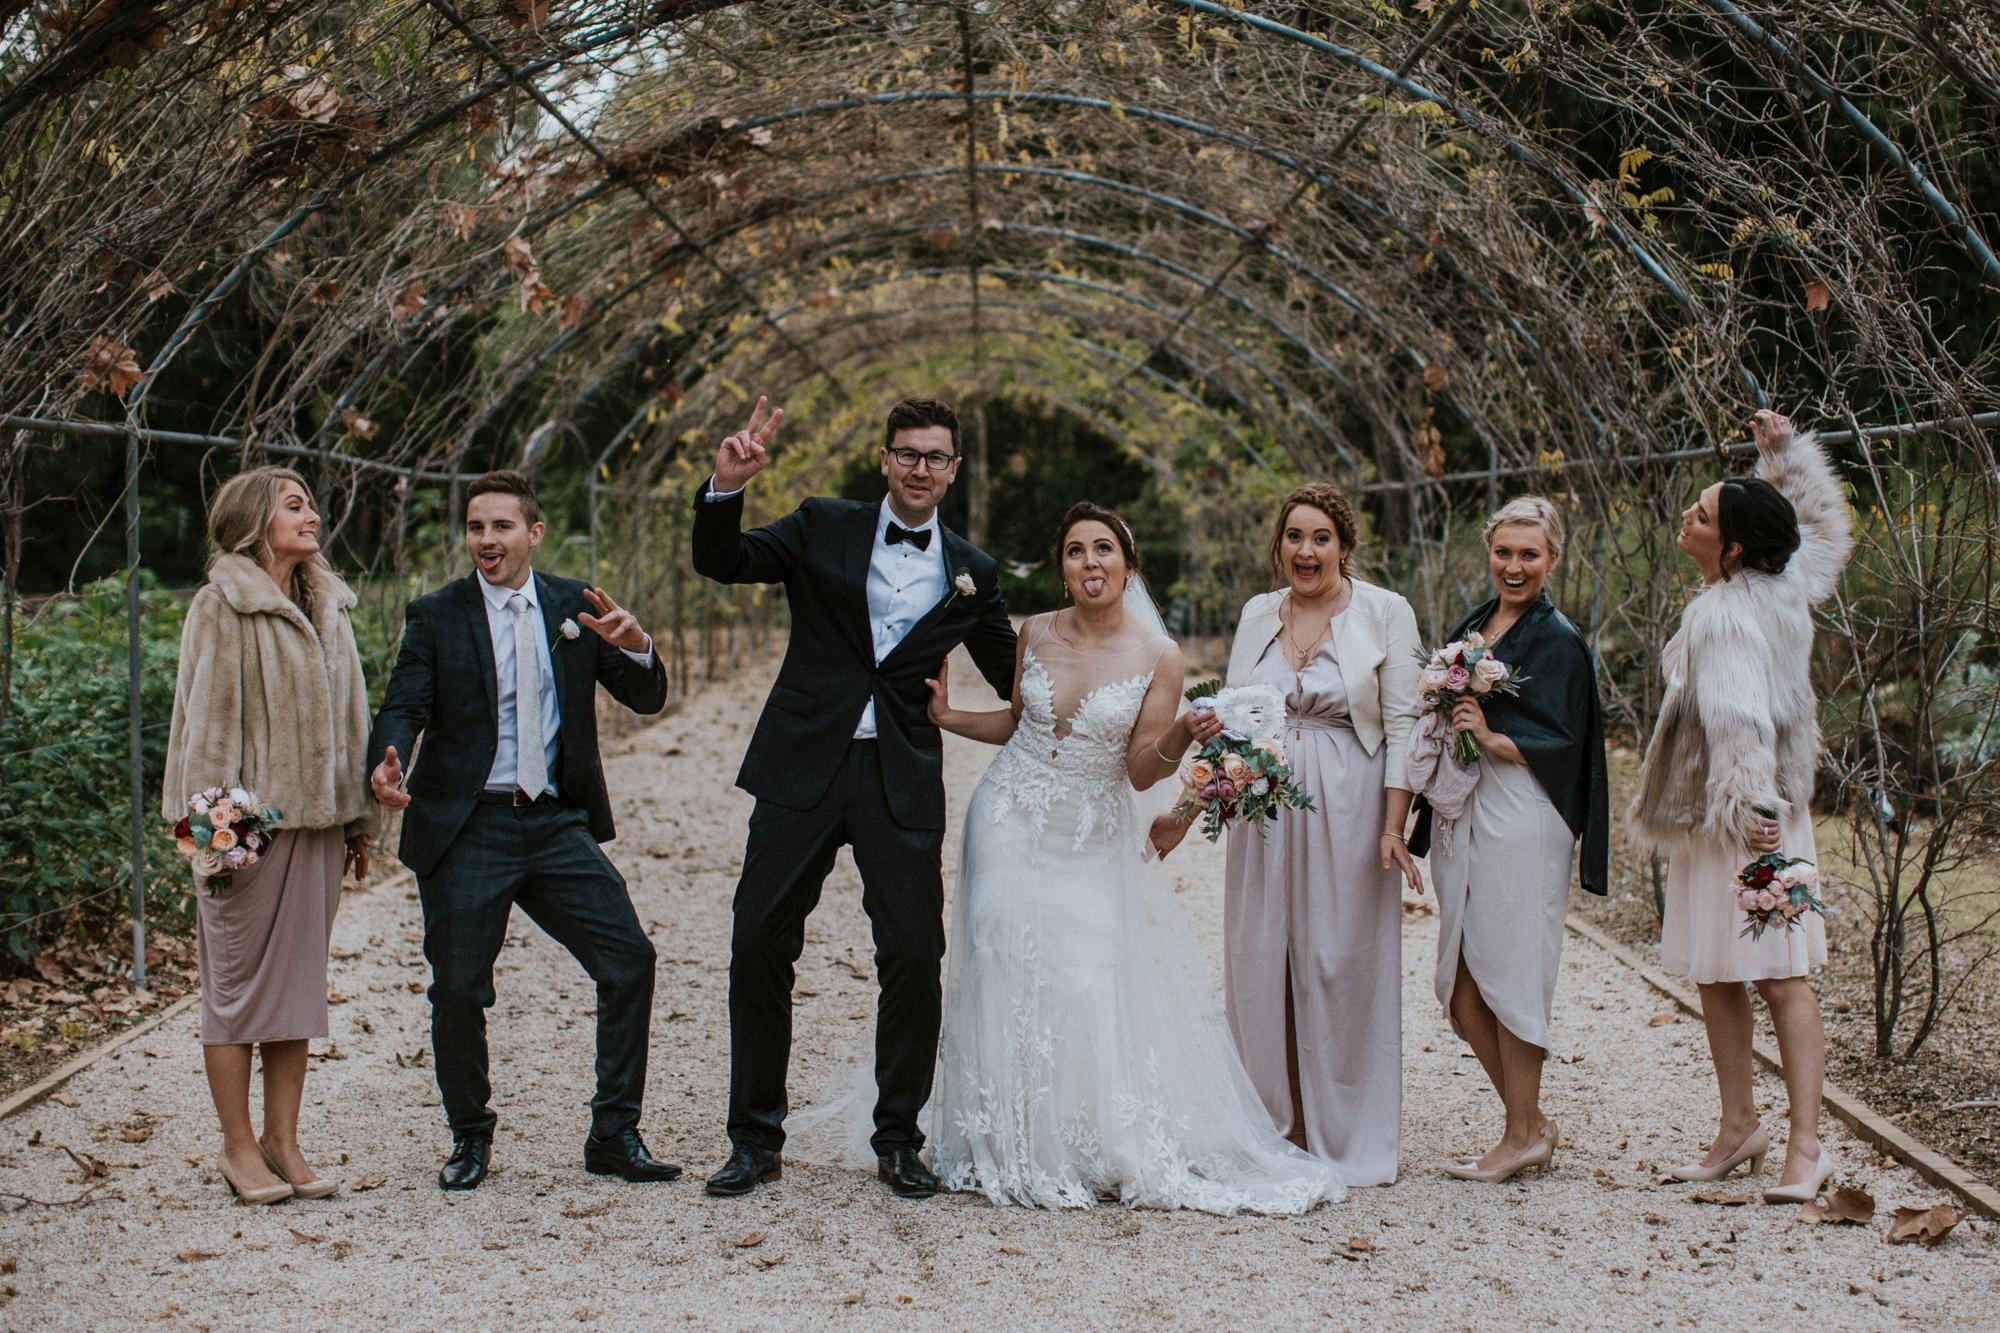 Dan Evans Photography Adelaide Based Wedding Destination Photographer Keira James St Cyprians Church South Australian 030